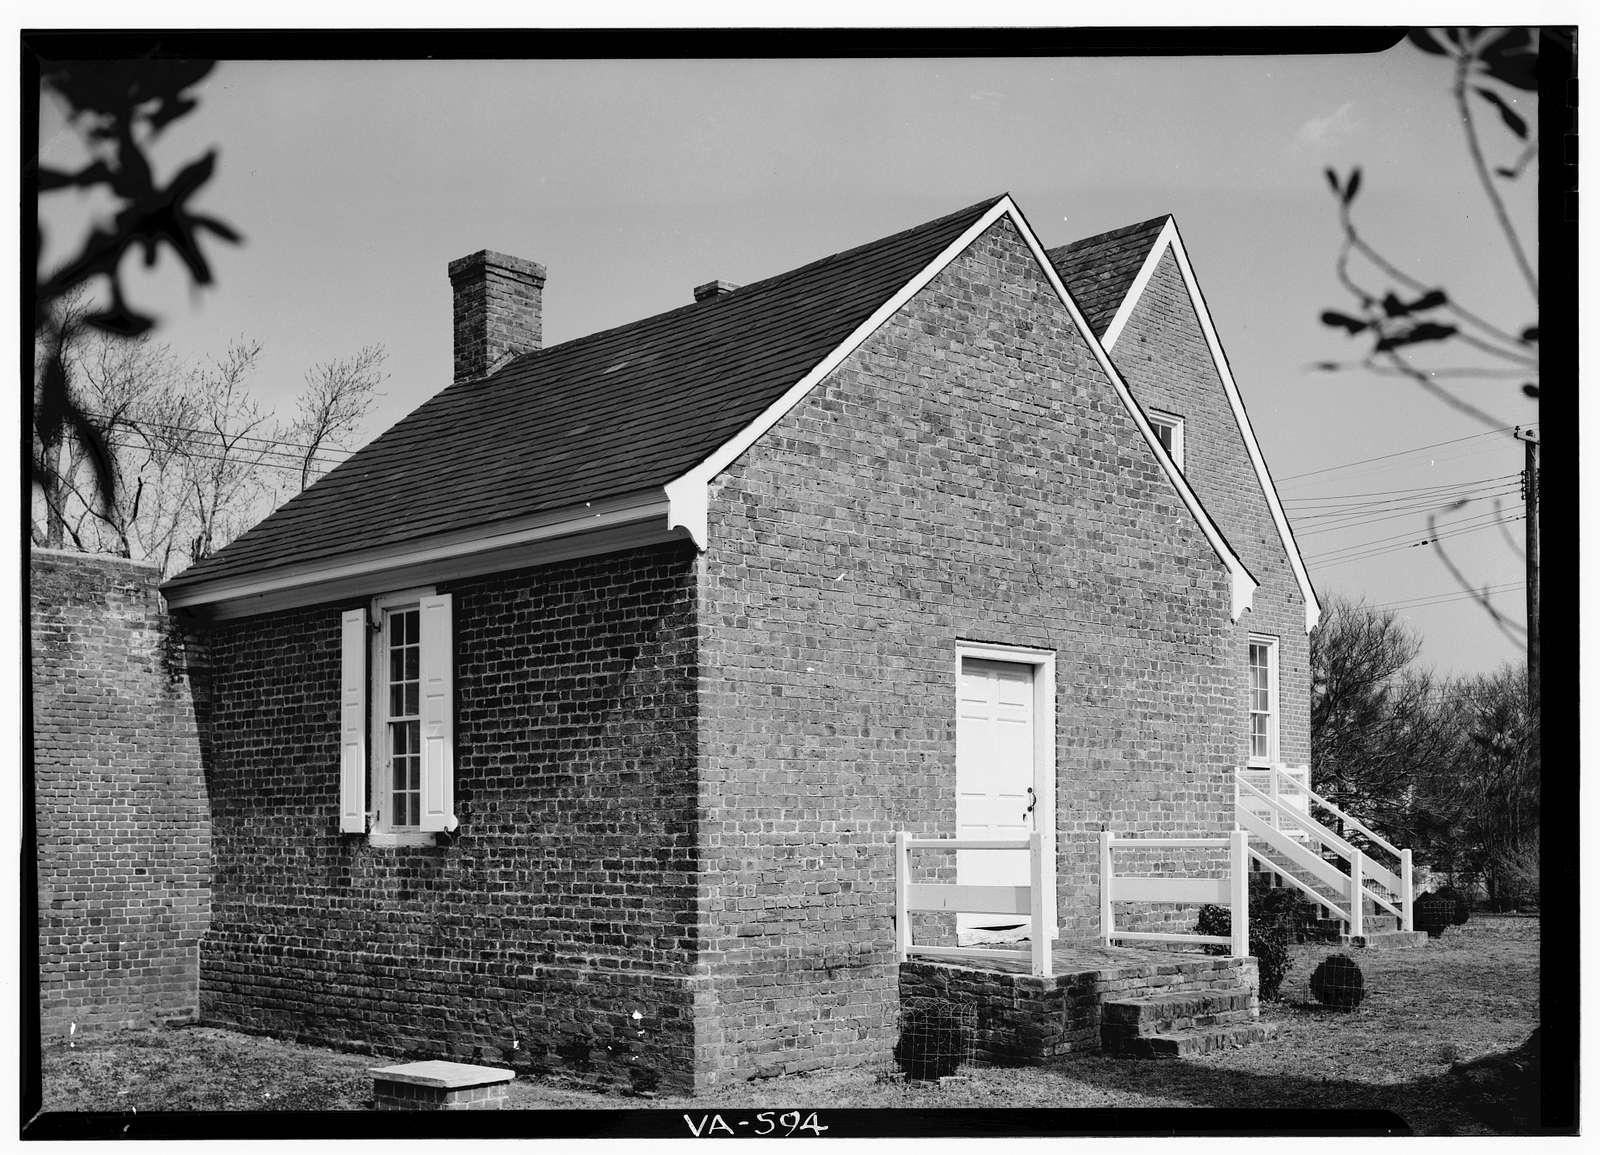 Courthouse Group Area Survey, U.S. Route 13, Eastville, Northampton County, VA